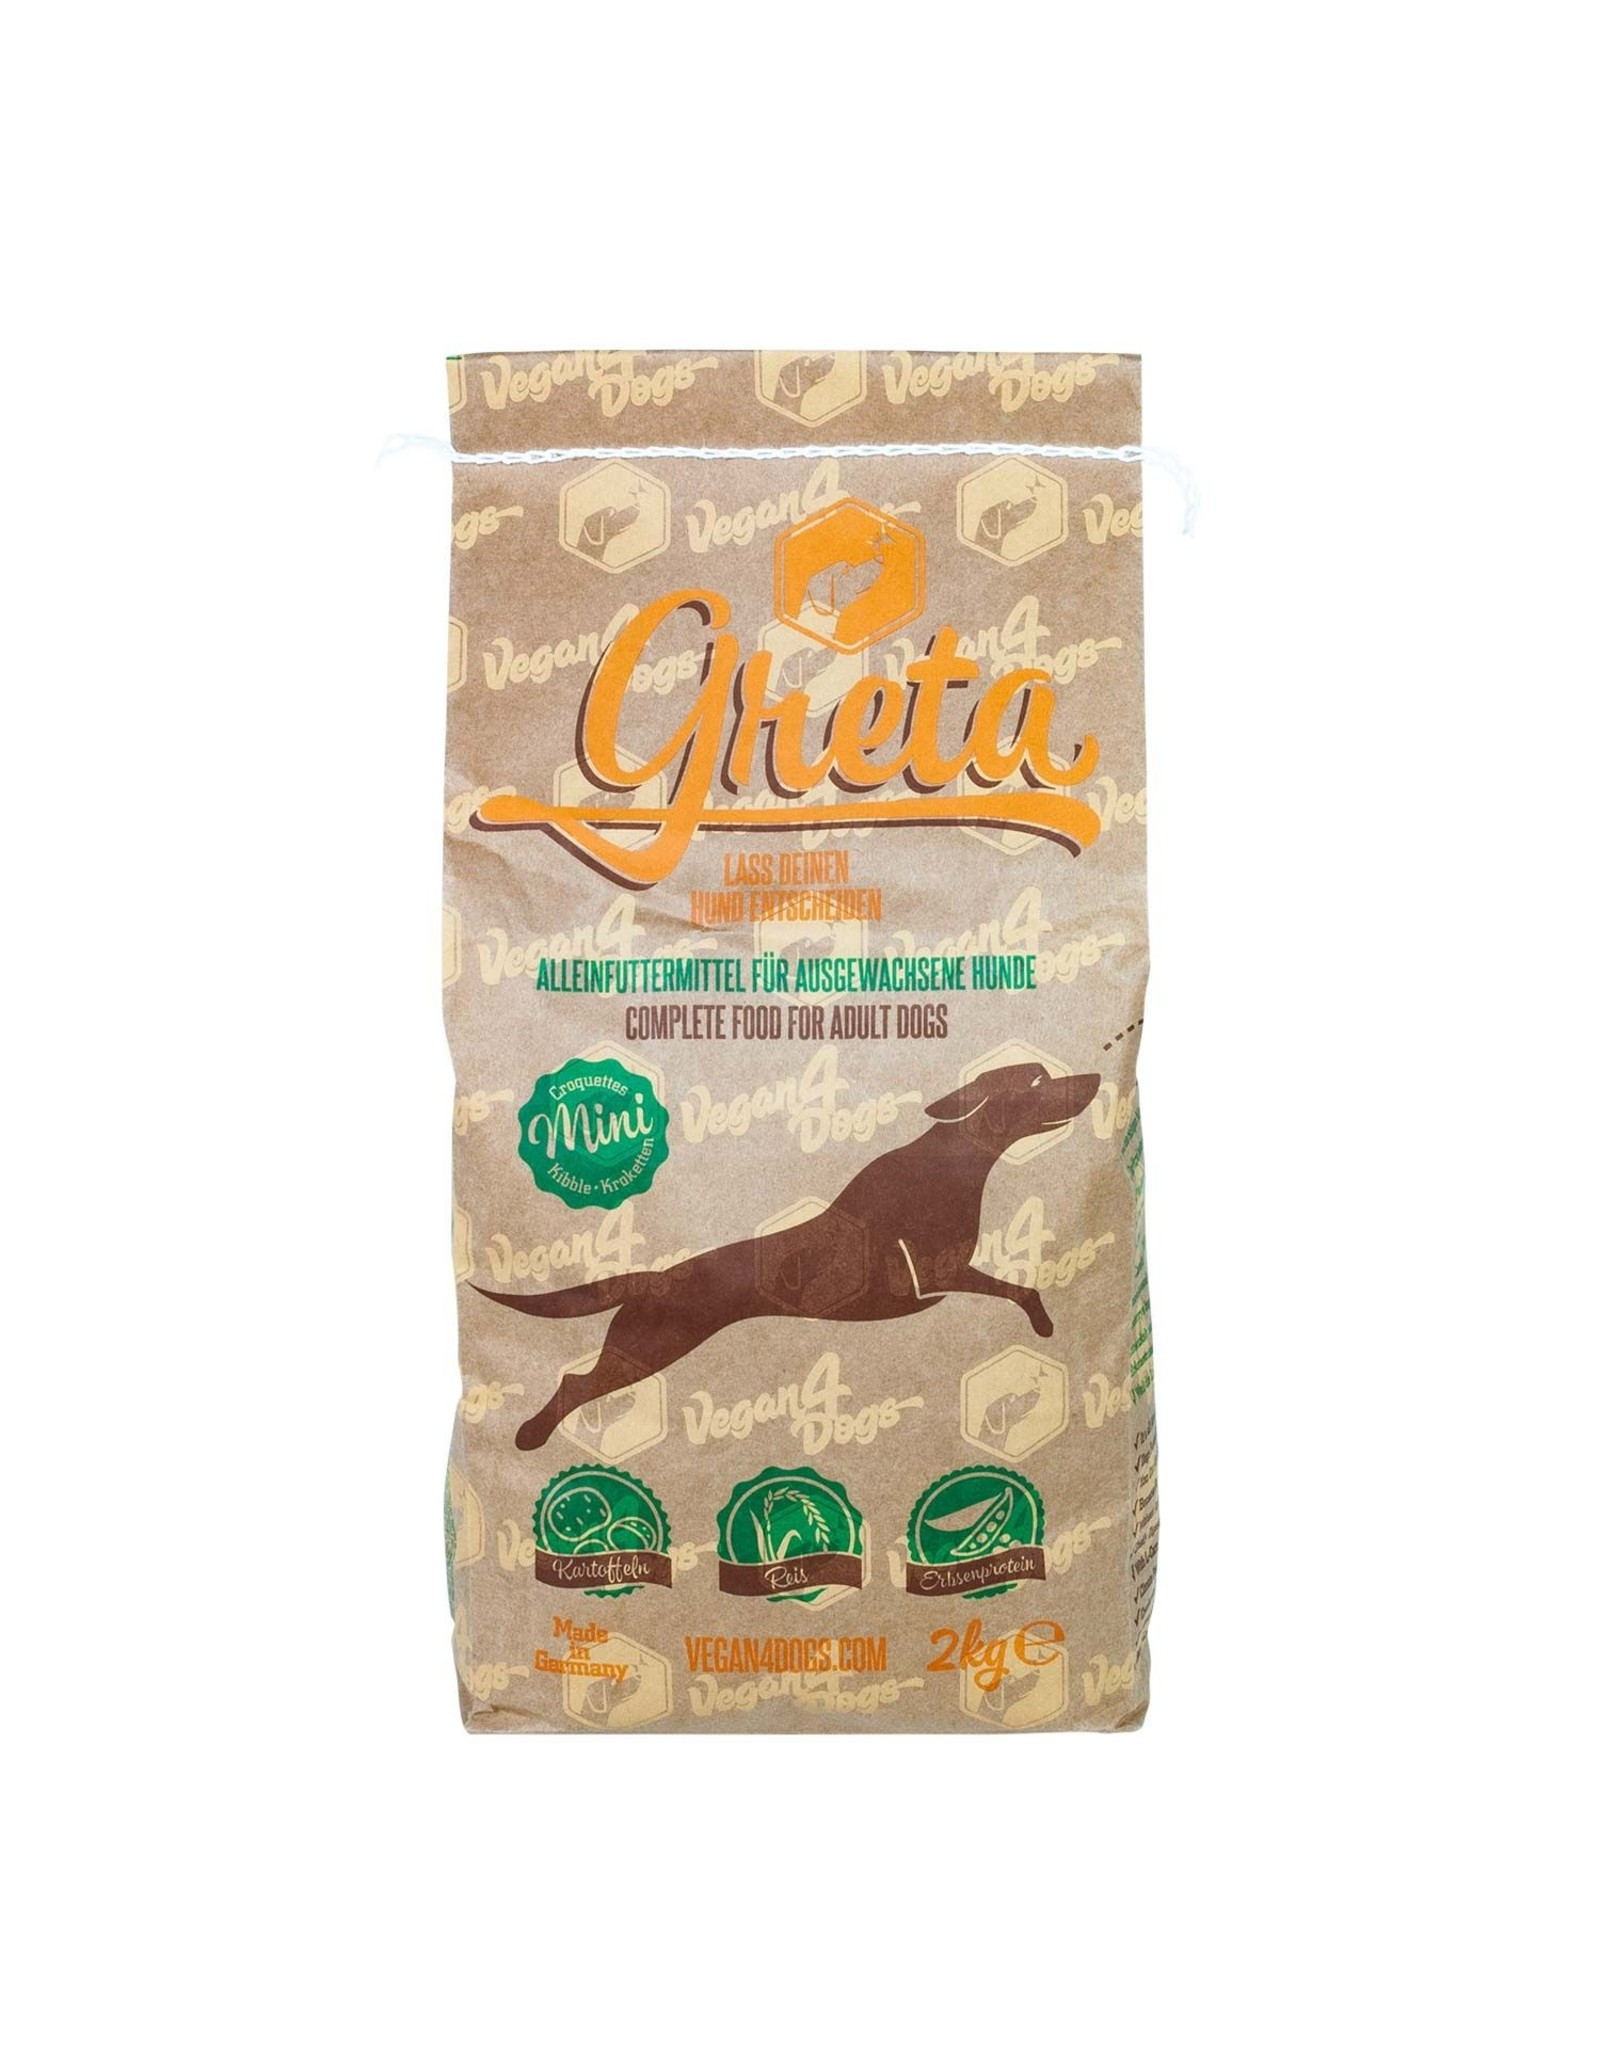 Vegan4Dogs Greta, kleine Kroketten, 10kg